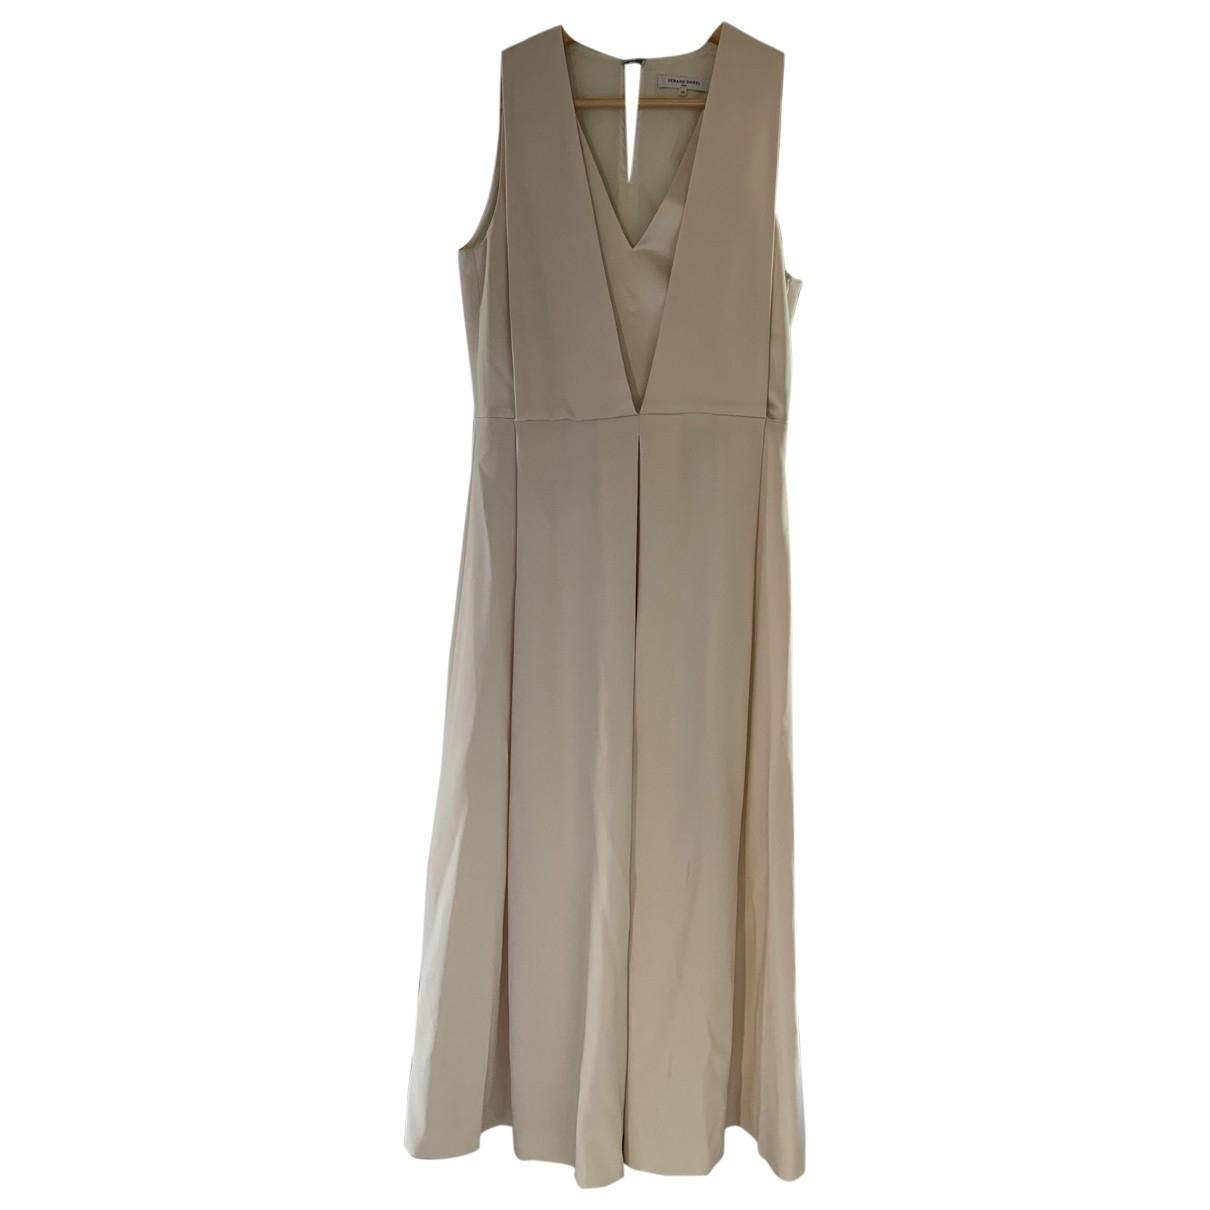 Gerard Darel \N Beige Cotton - elasthane dress for Women 36 FR